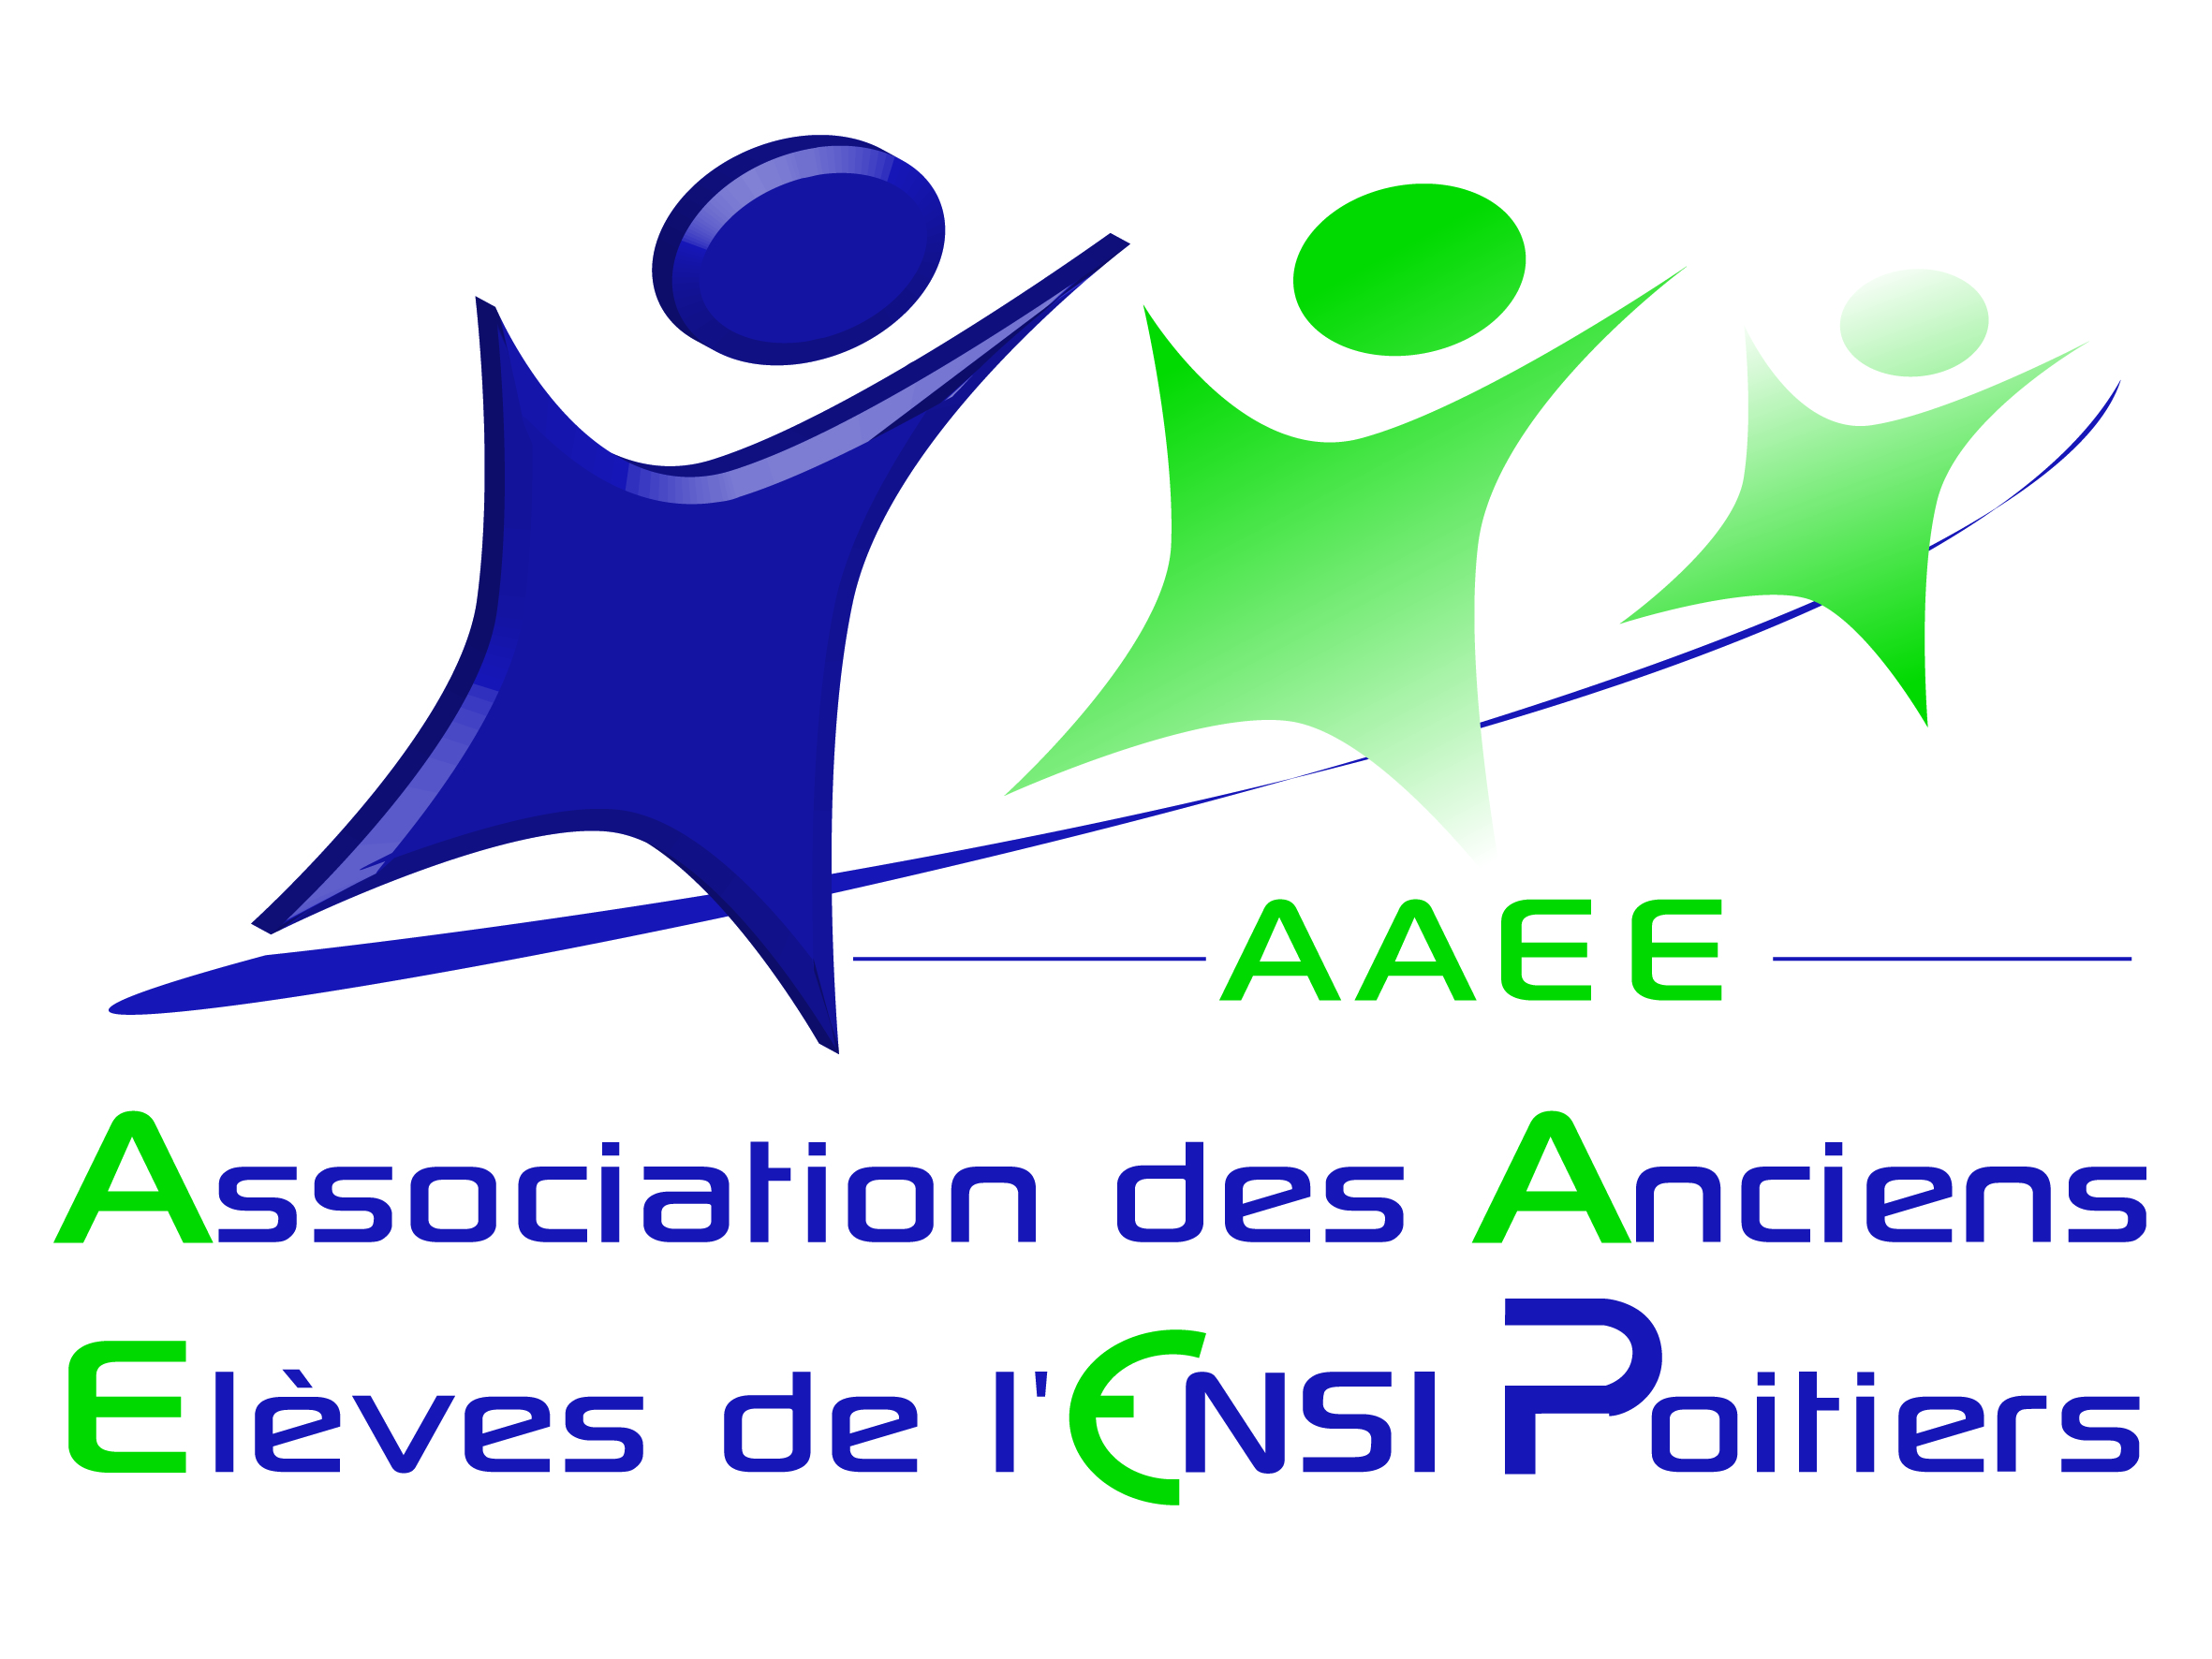 AAE ENSI Poitiers